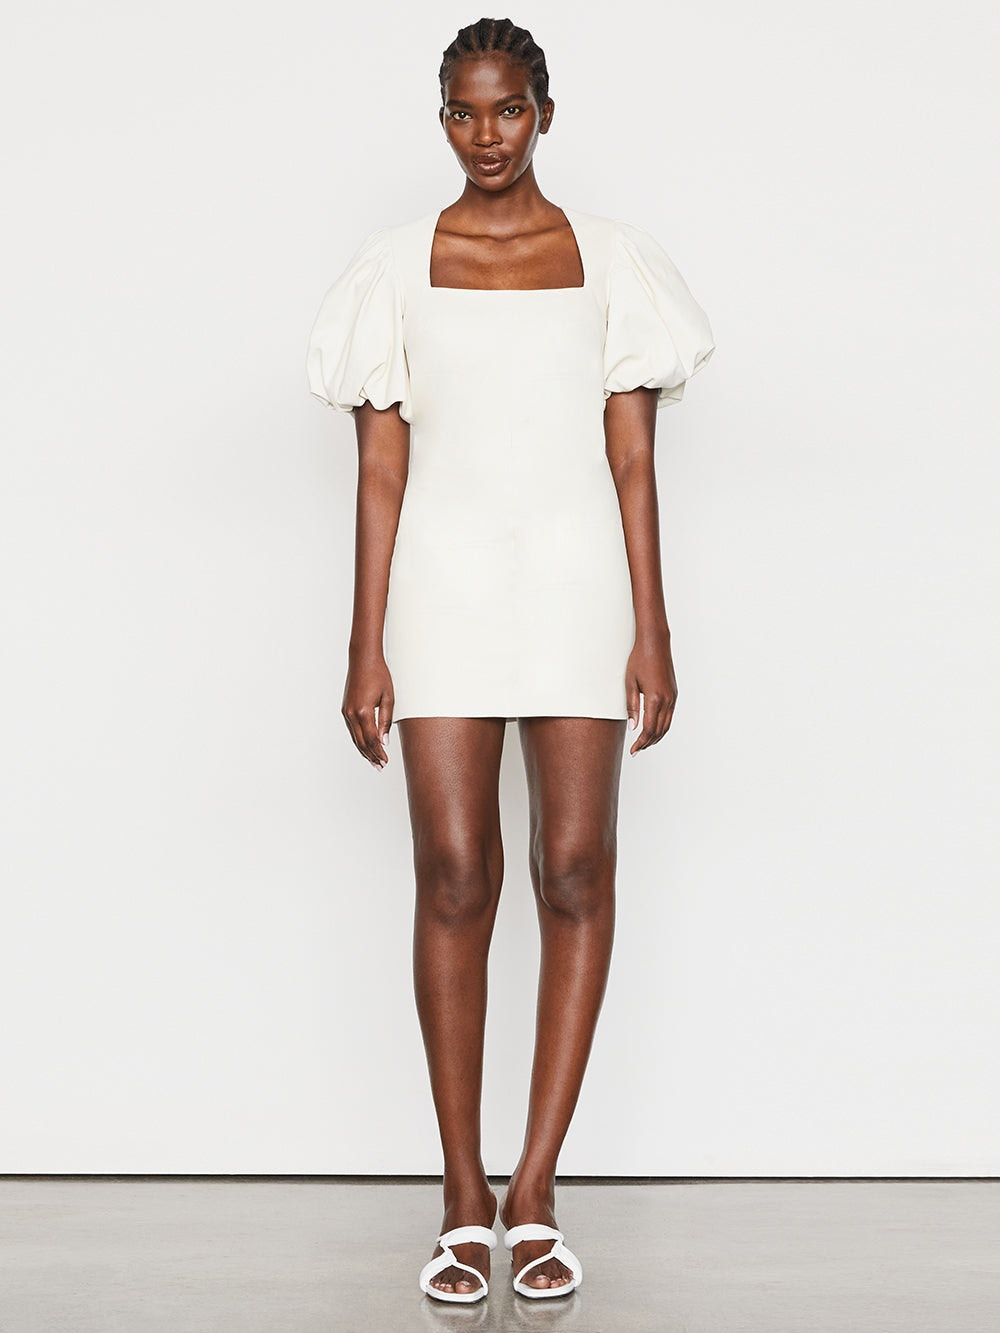 dress full body view